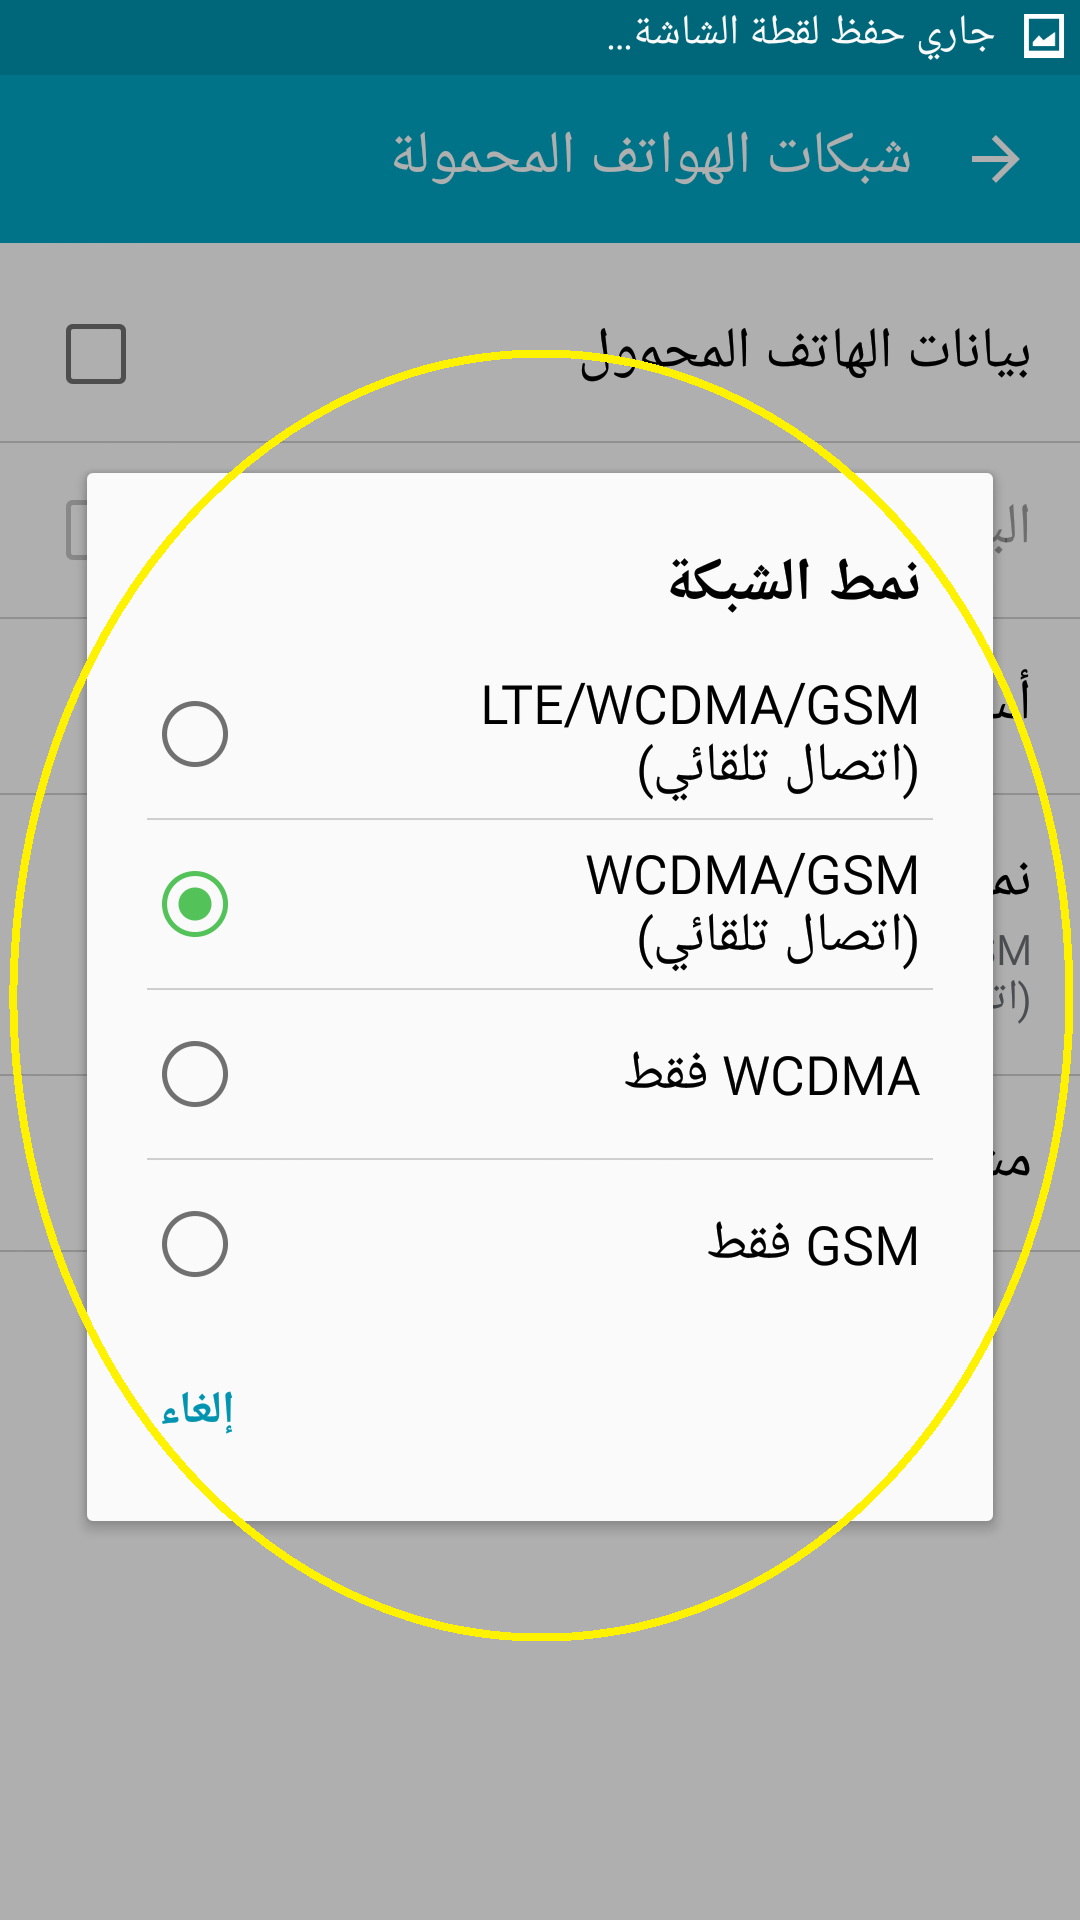 LTE/WCDMA/GSM, WCDMA/GSM, WCDMA, GSM